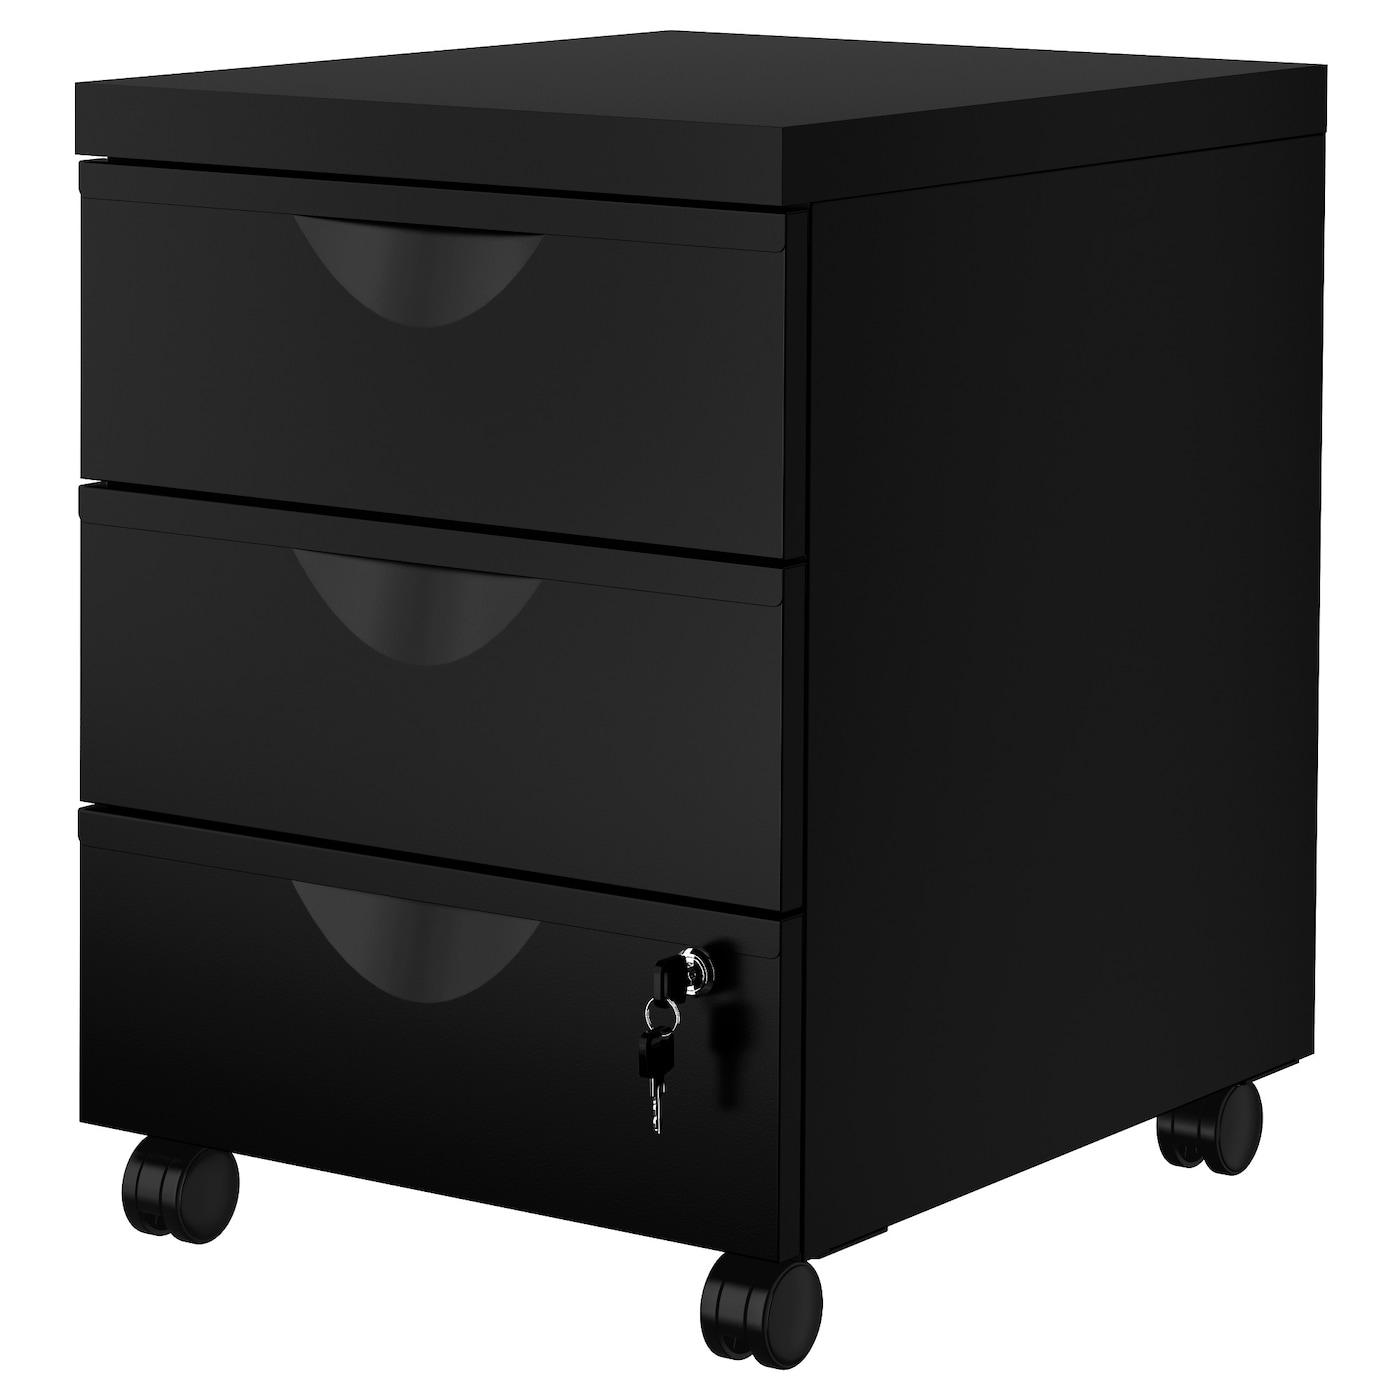 Erik Drawer Unit W 3 Drawers On Casters Black 16 1 8x22 1 2 Ikea